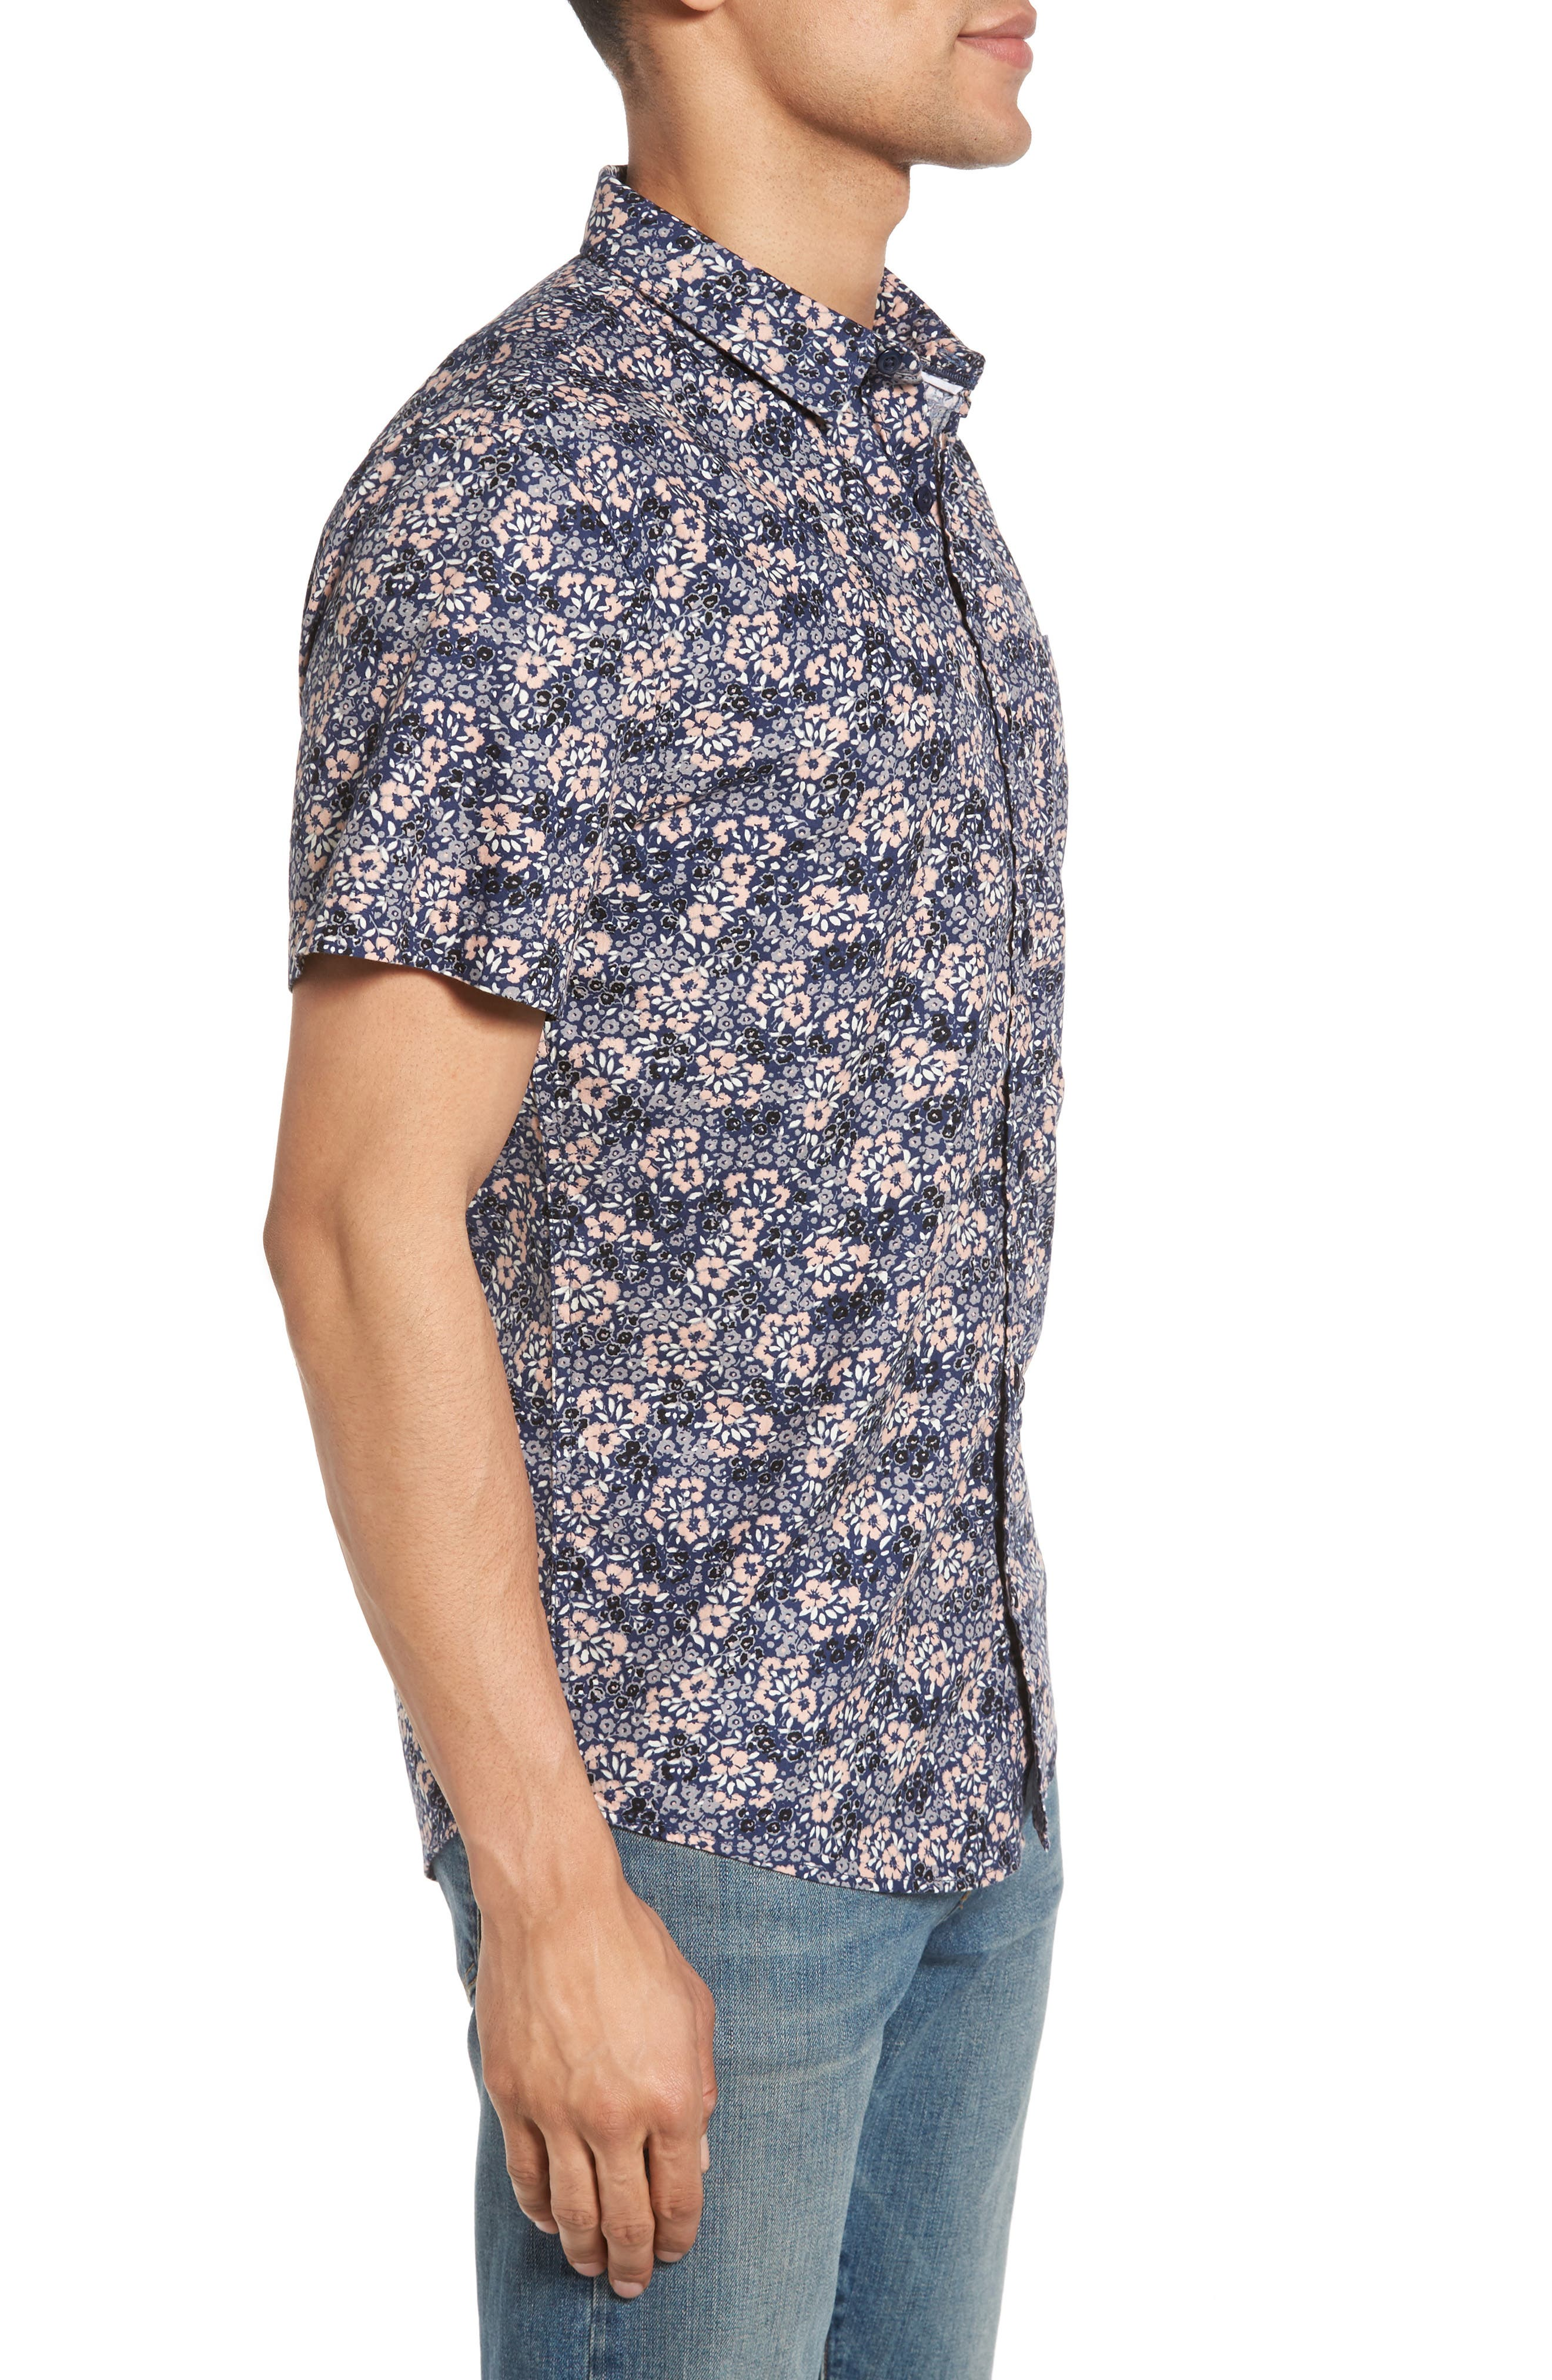 Poplin Floral Shirt,                             Alternate thumbnail 3, color,                             Navy Peacoat Simple Floral